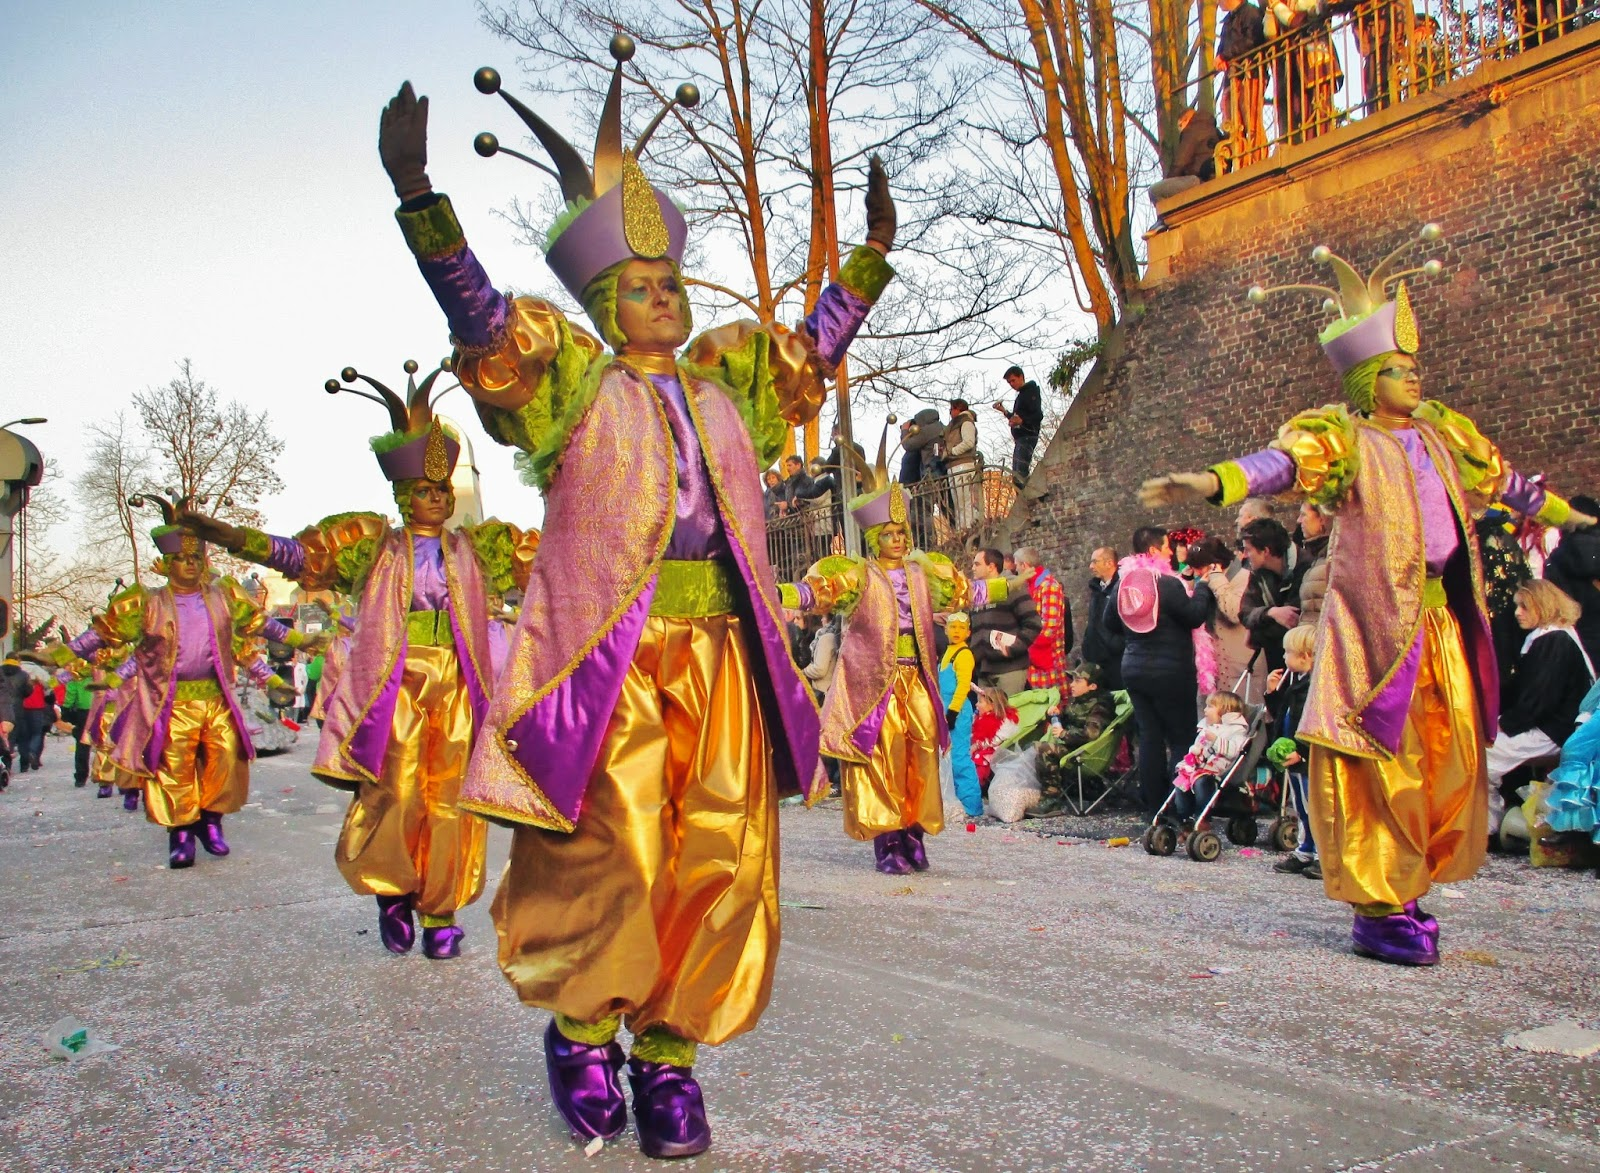 Carnaval Aalst foto- en videoblog: Aalst Carnaval 2017